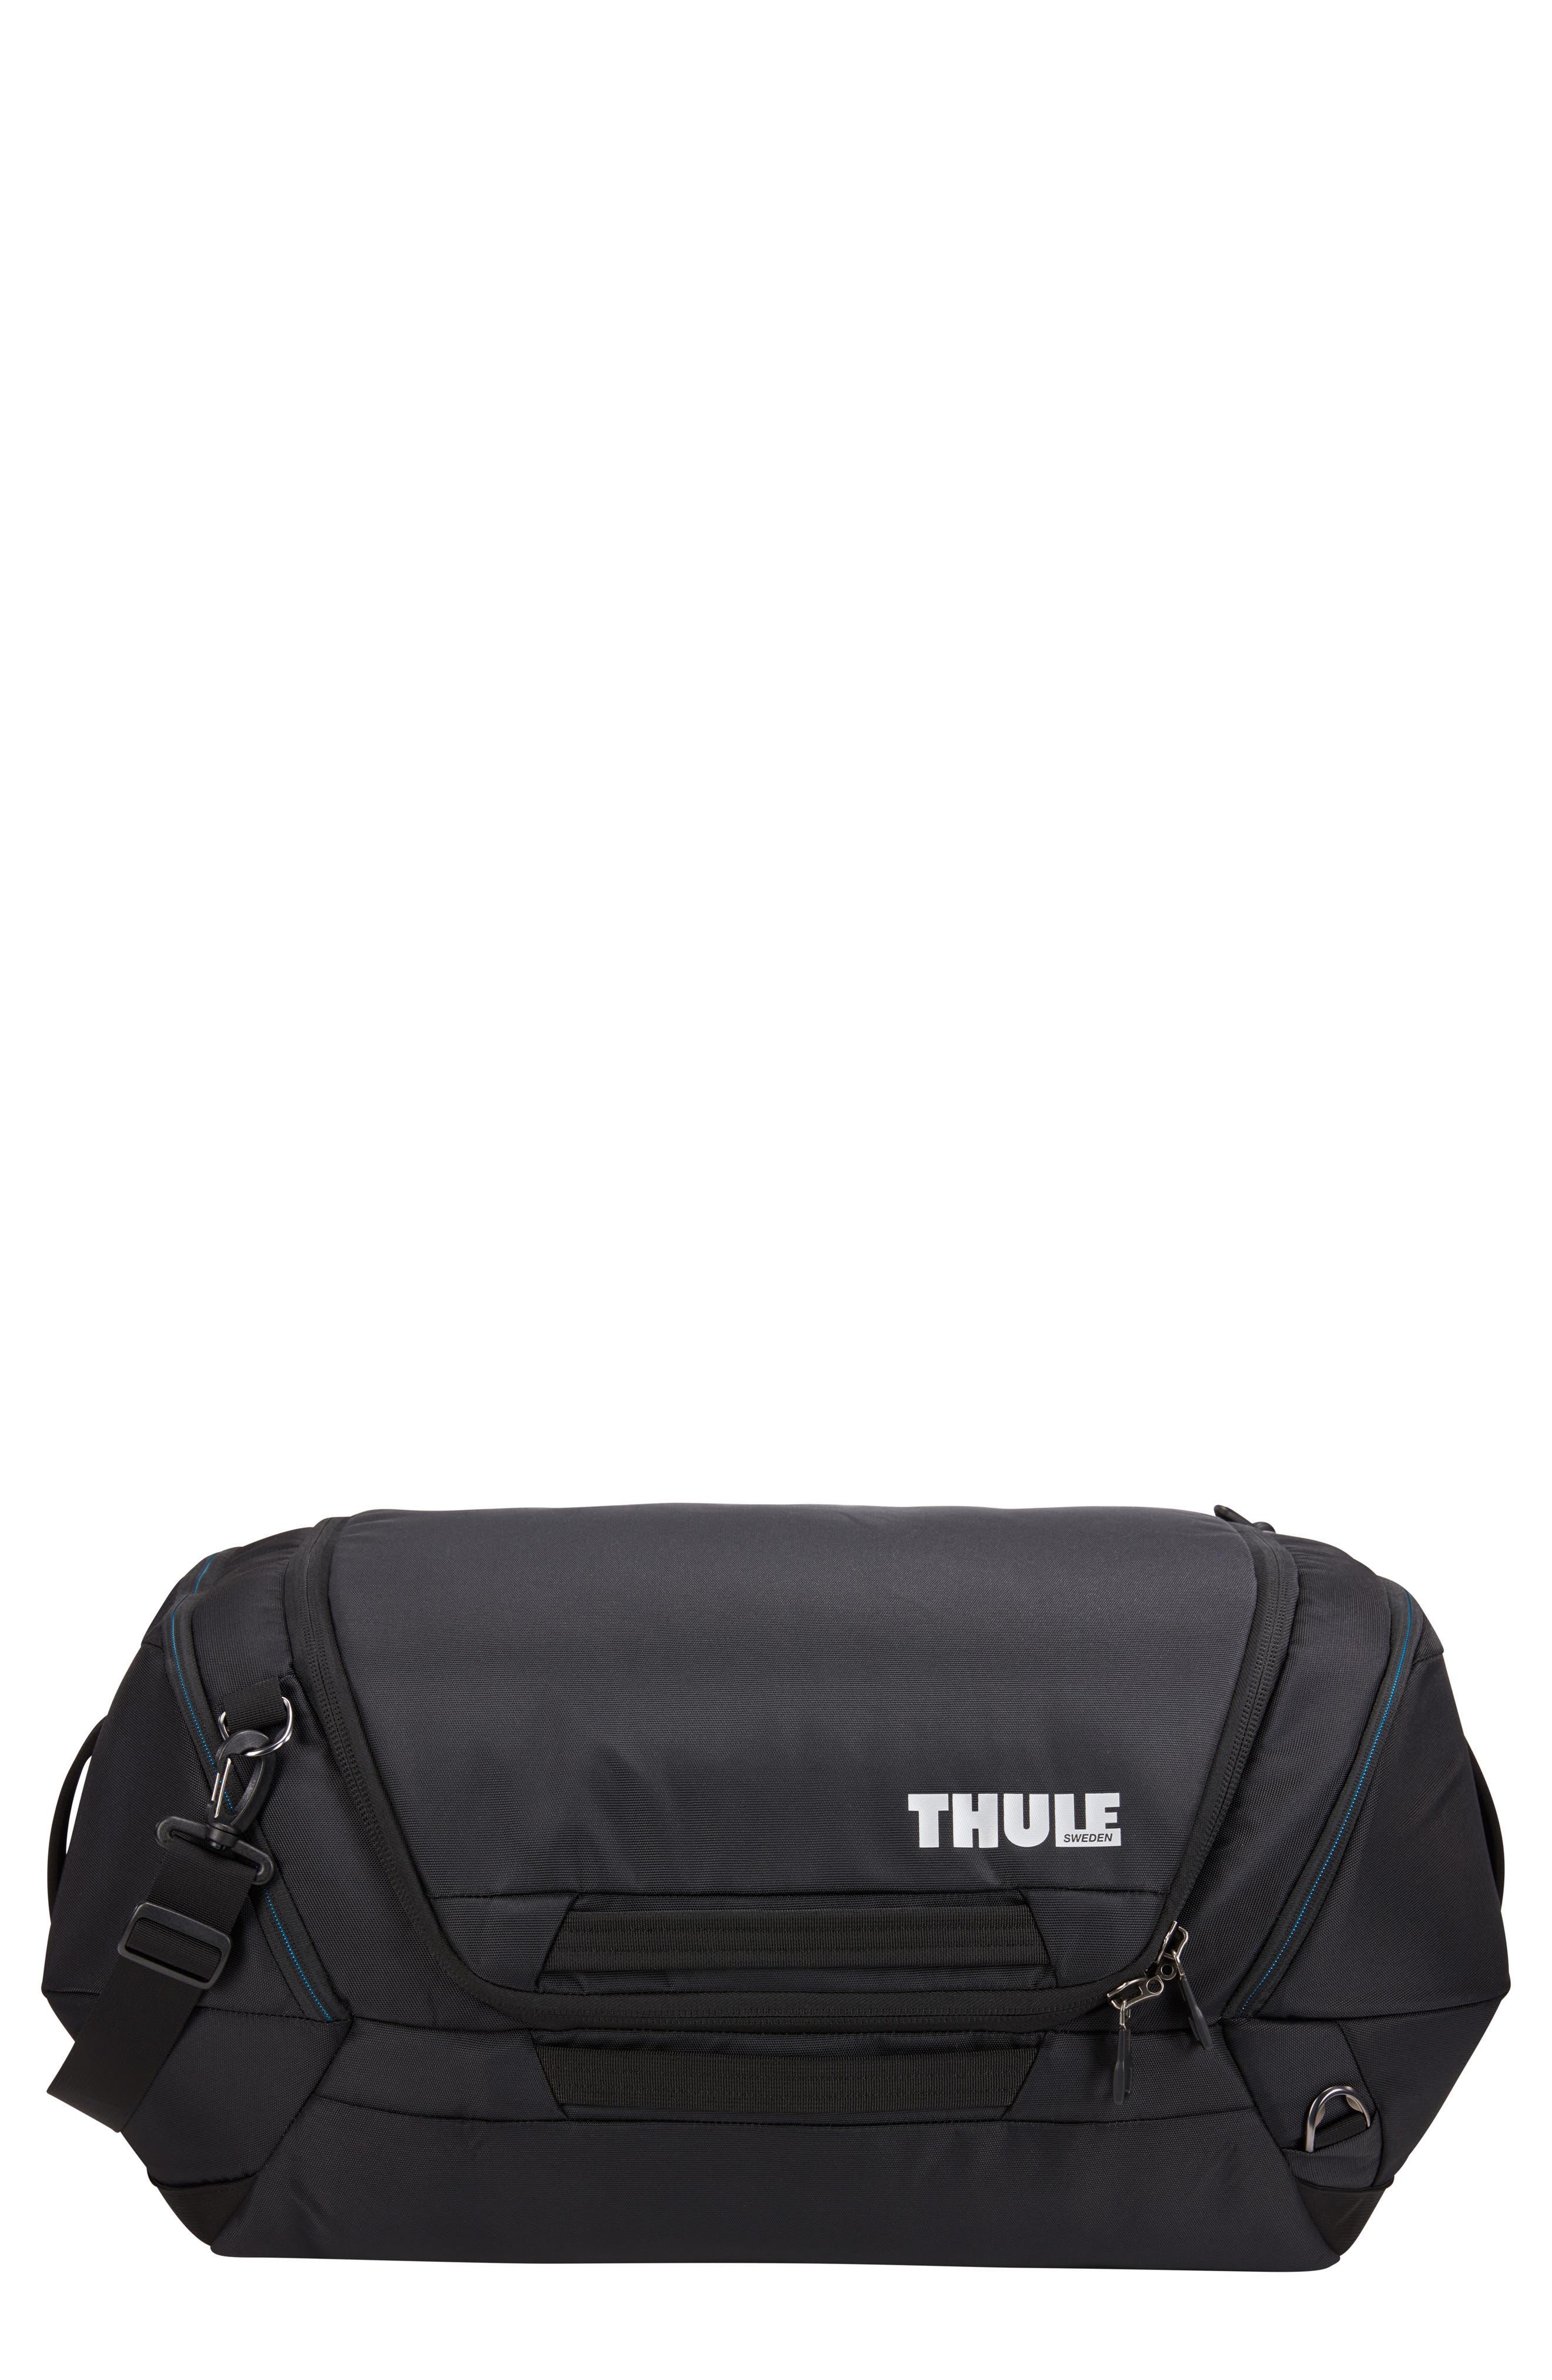 Thule Subterra 60-Liter Duffle Bag